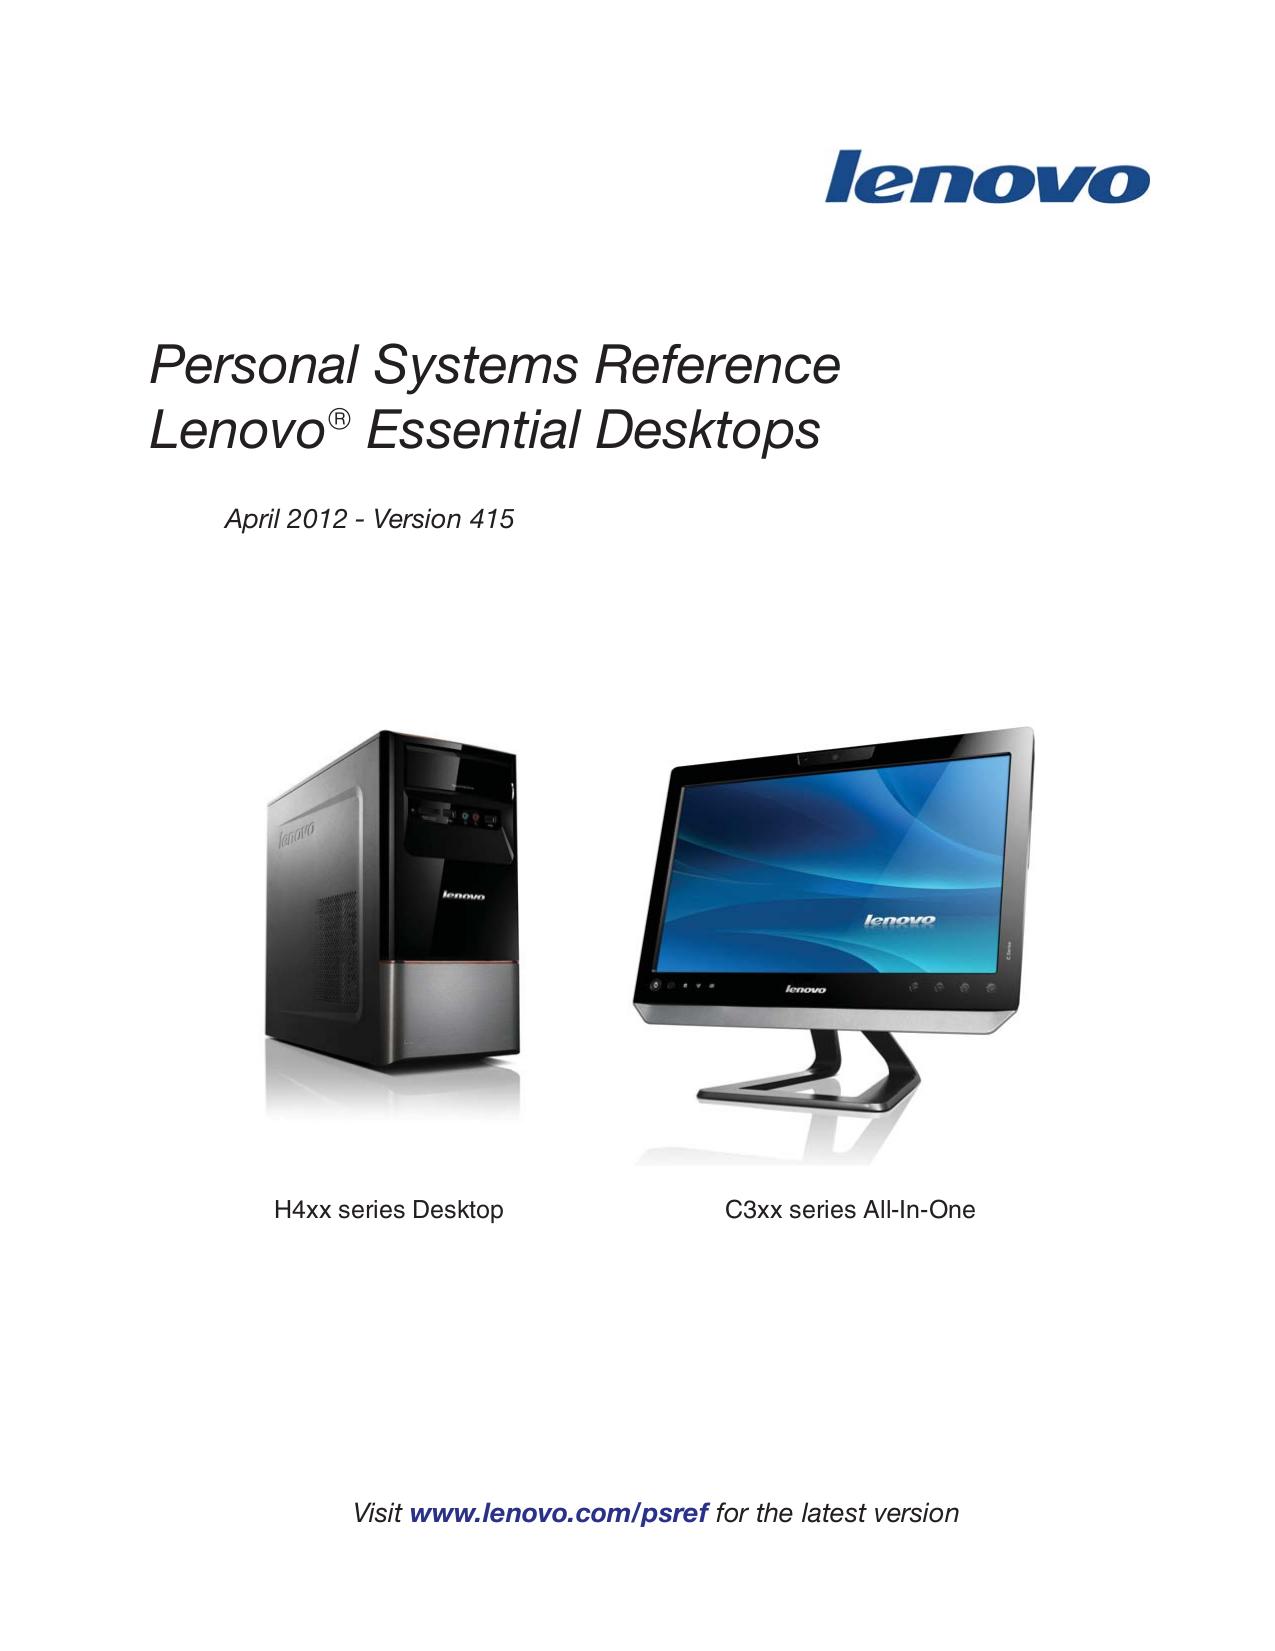 pdf for Lenovo Desktop IdeaCentre H405 7723 manual